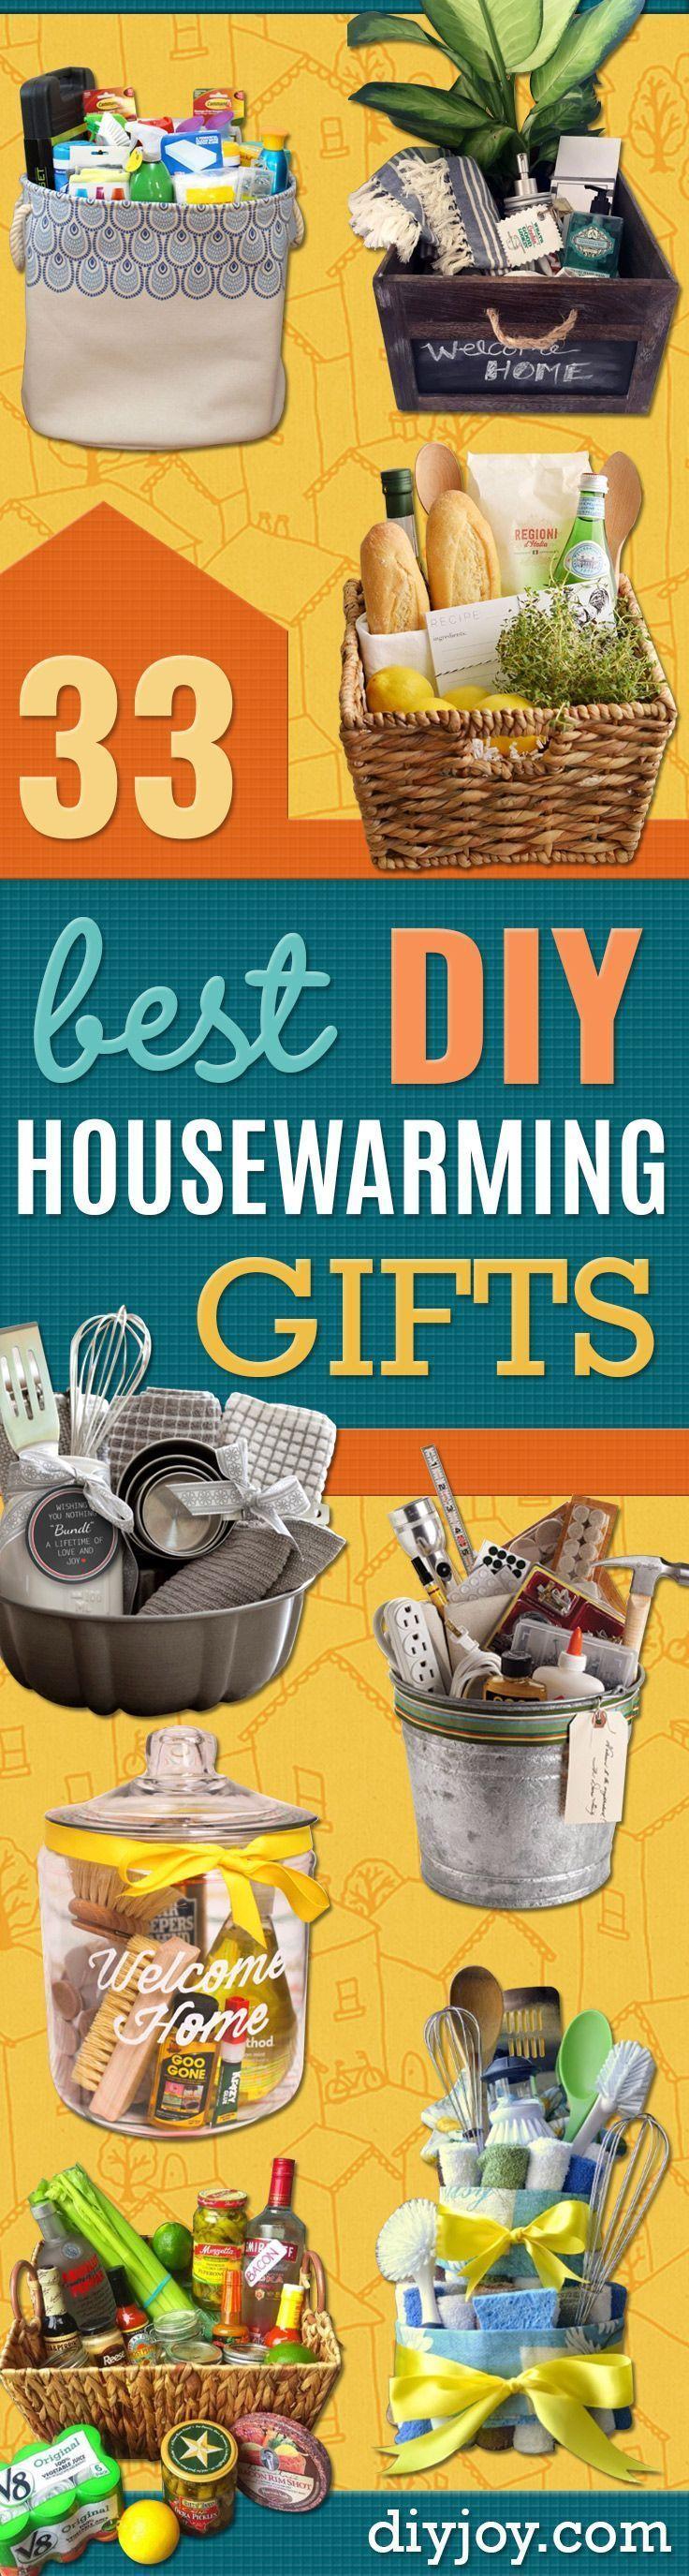 33 Best DIY Housewarming Gifts CREATE {DIY